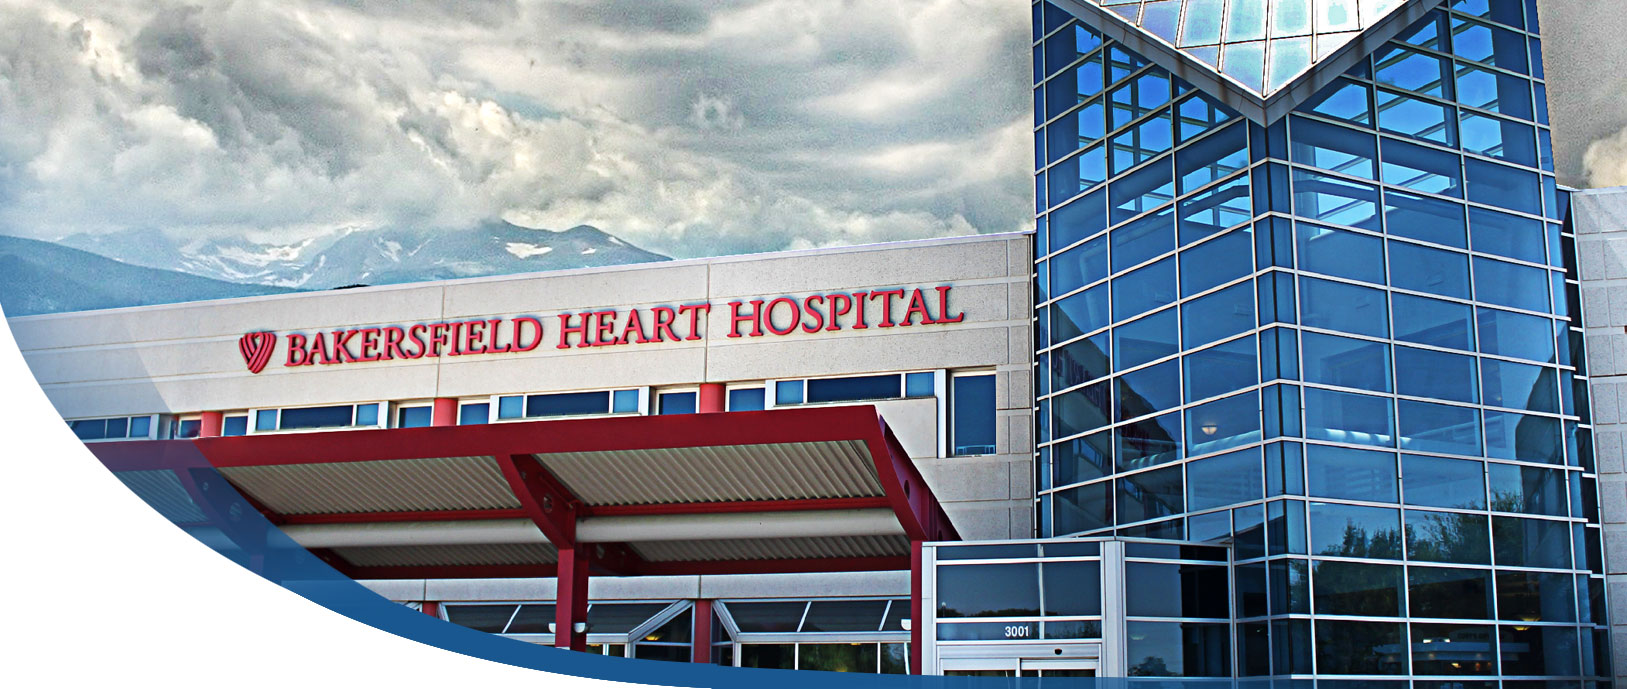 Bakersfield Heart Hospital